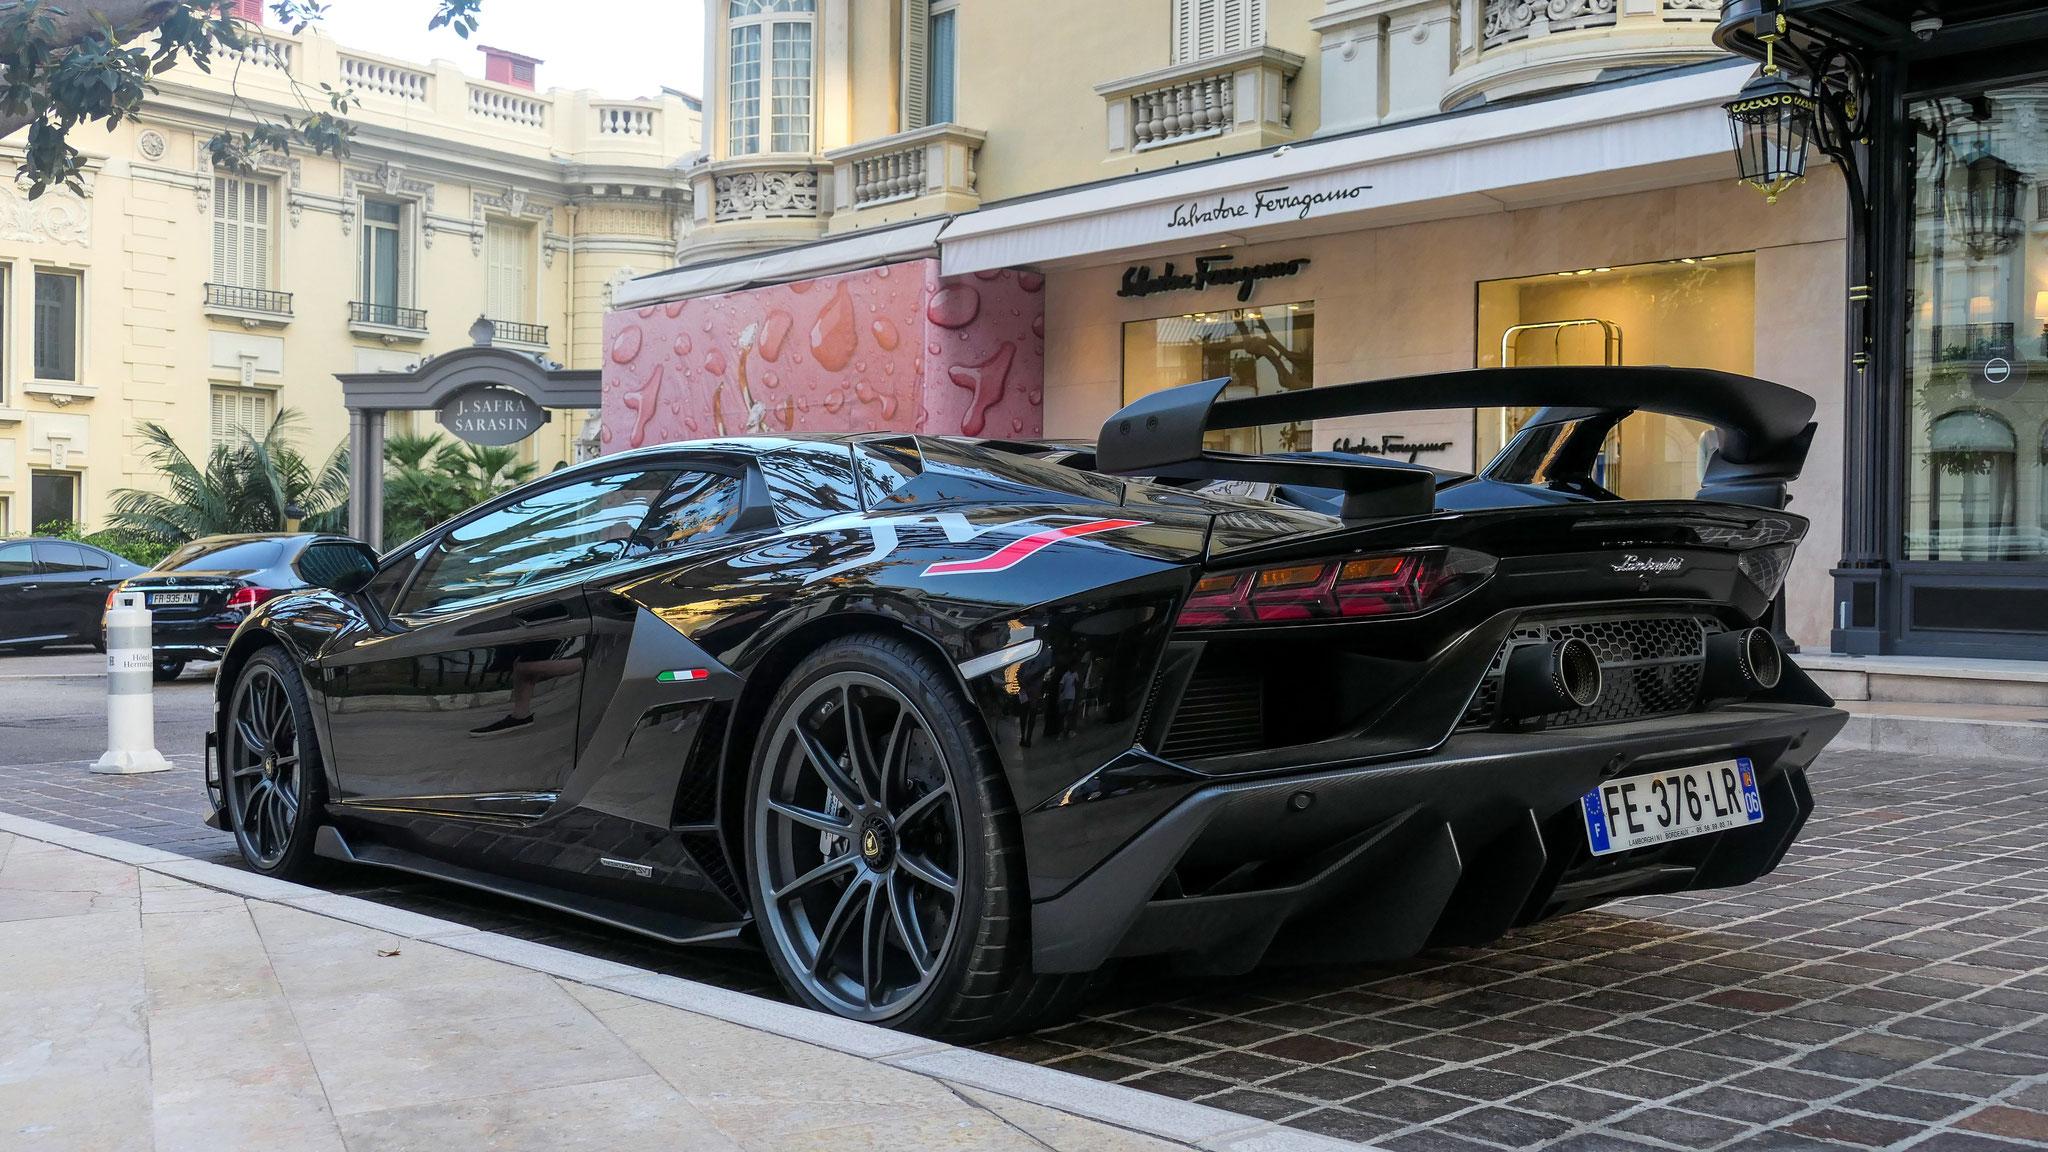 Lamborghini Aventador LP 770 SVJ - FE-376-LR-06 (FRA)